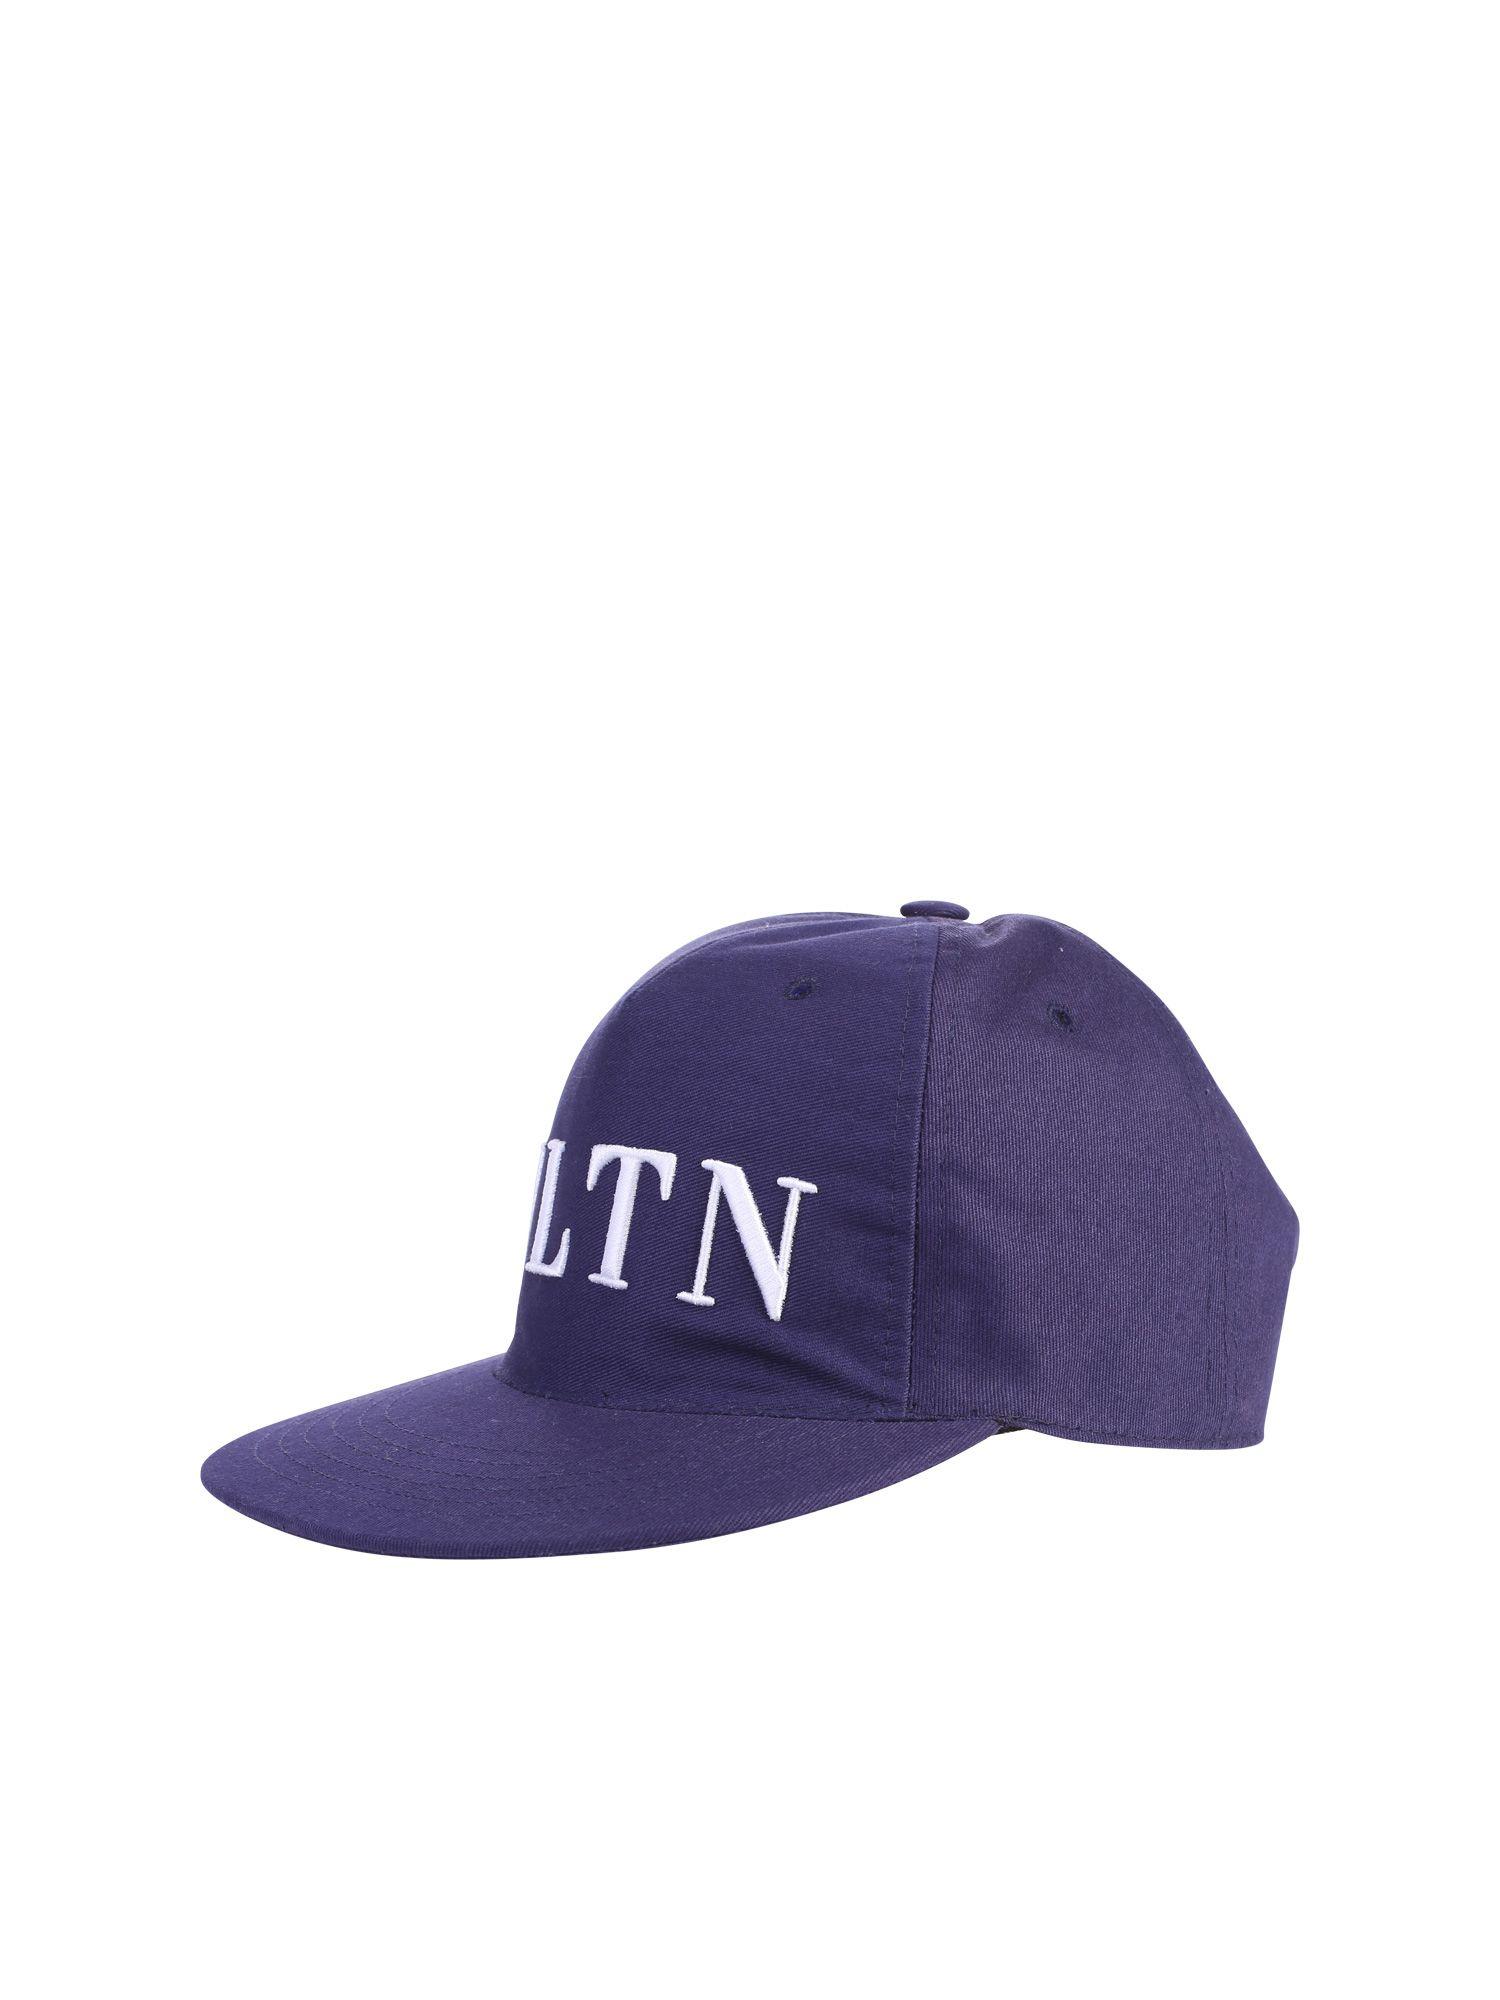 VALENTINO EMBROIDERED BASEBALL HAT